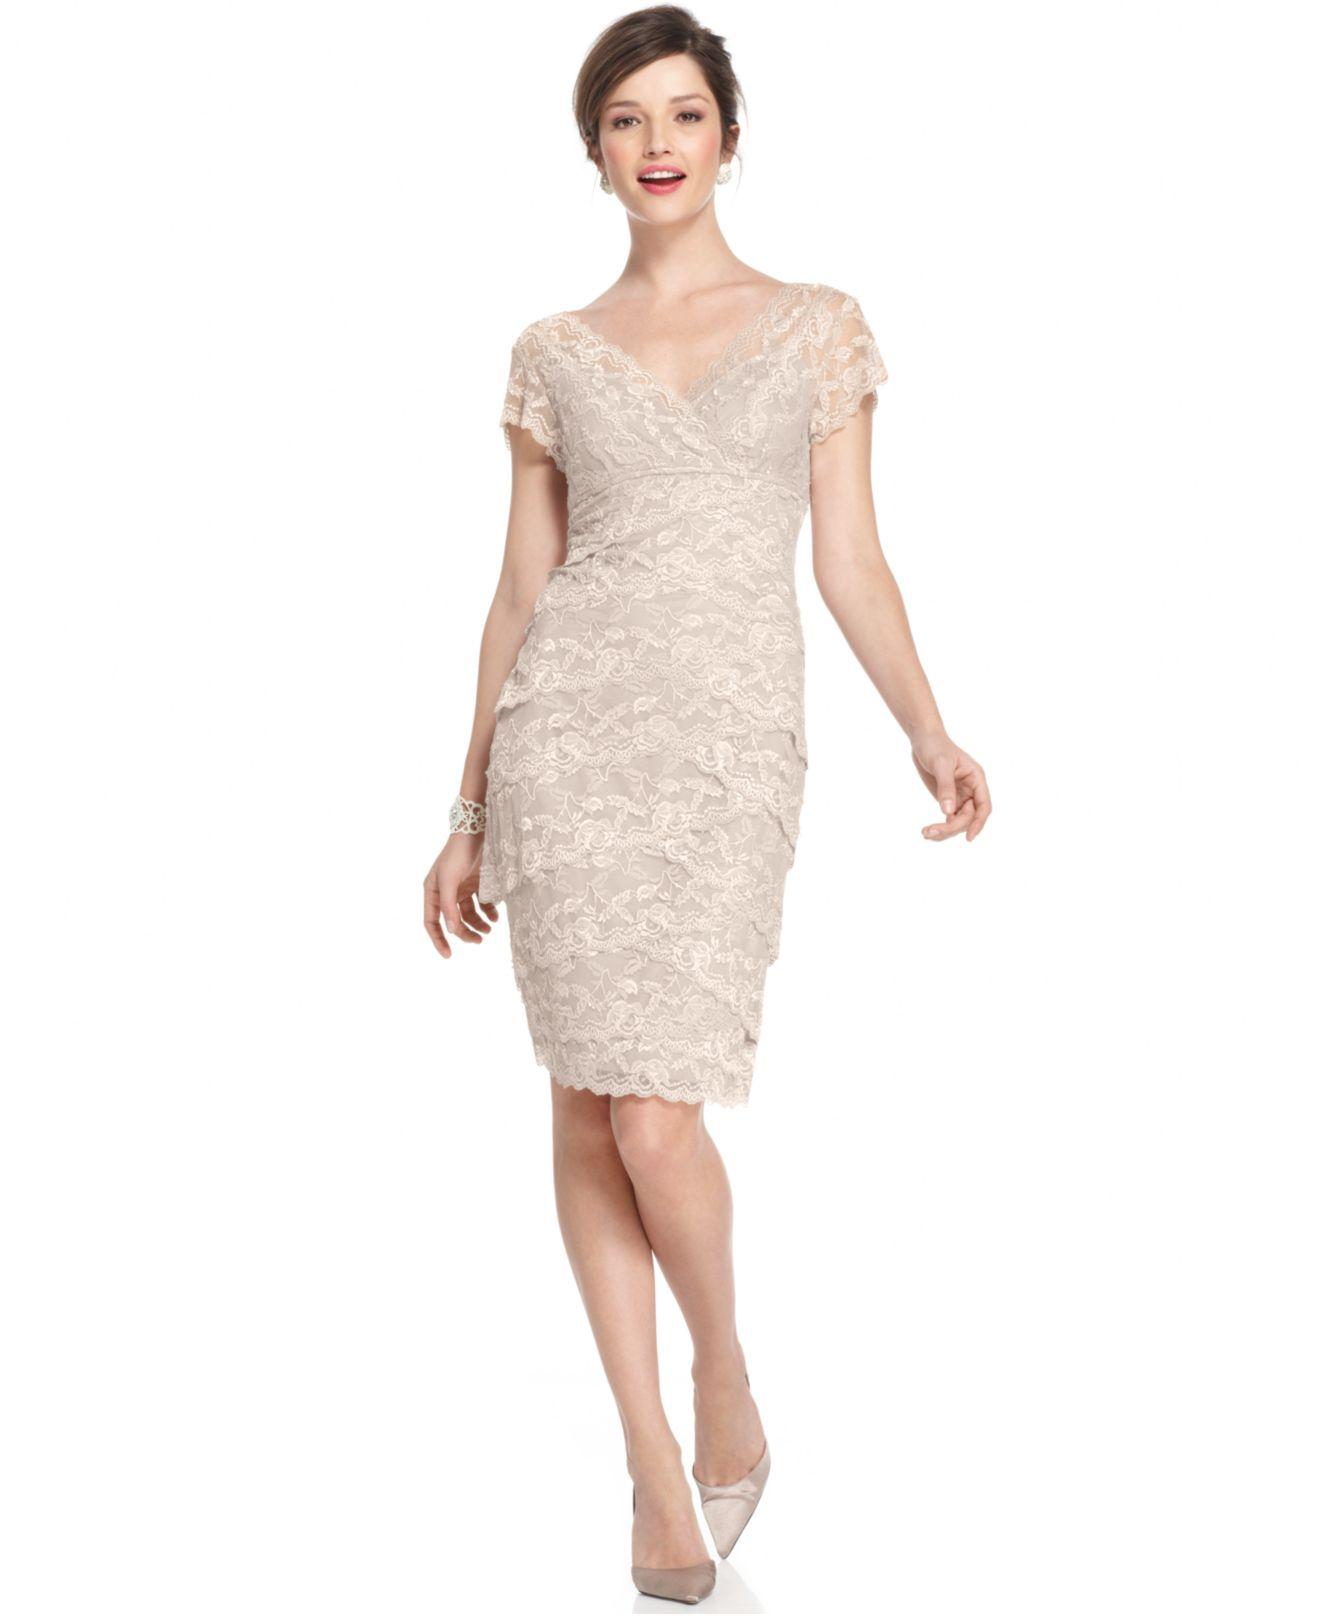 ae3e7571d Marina Dress